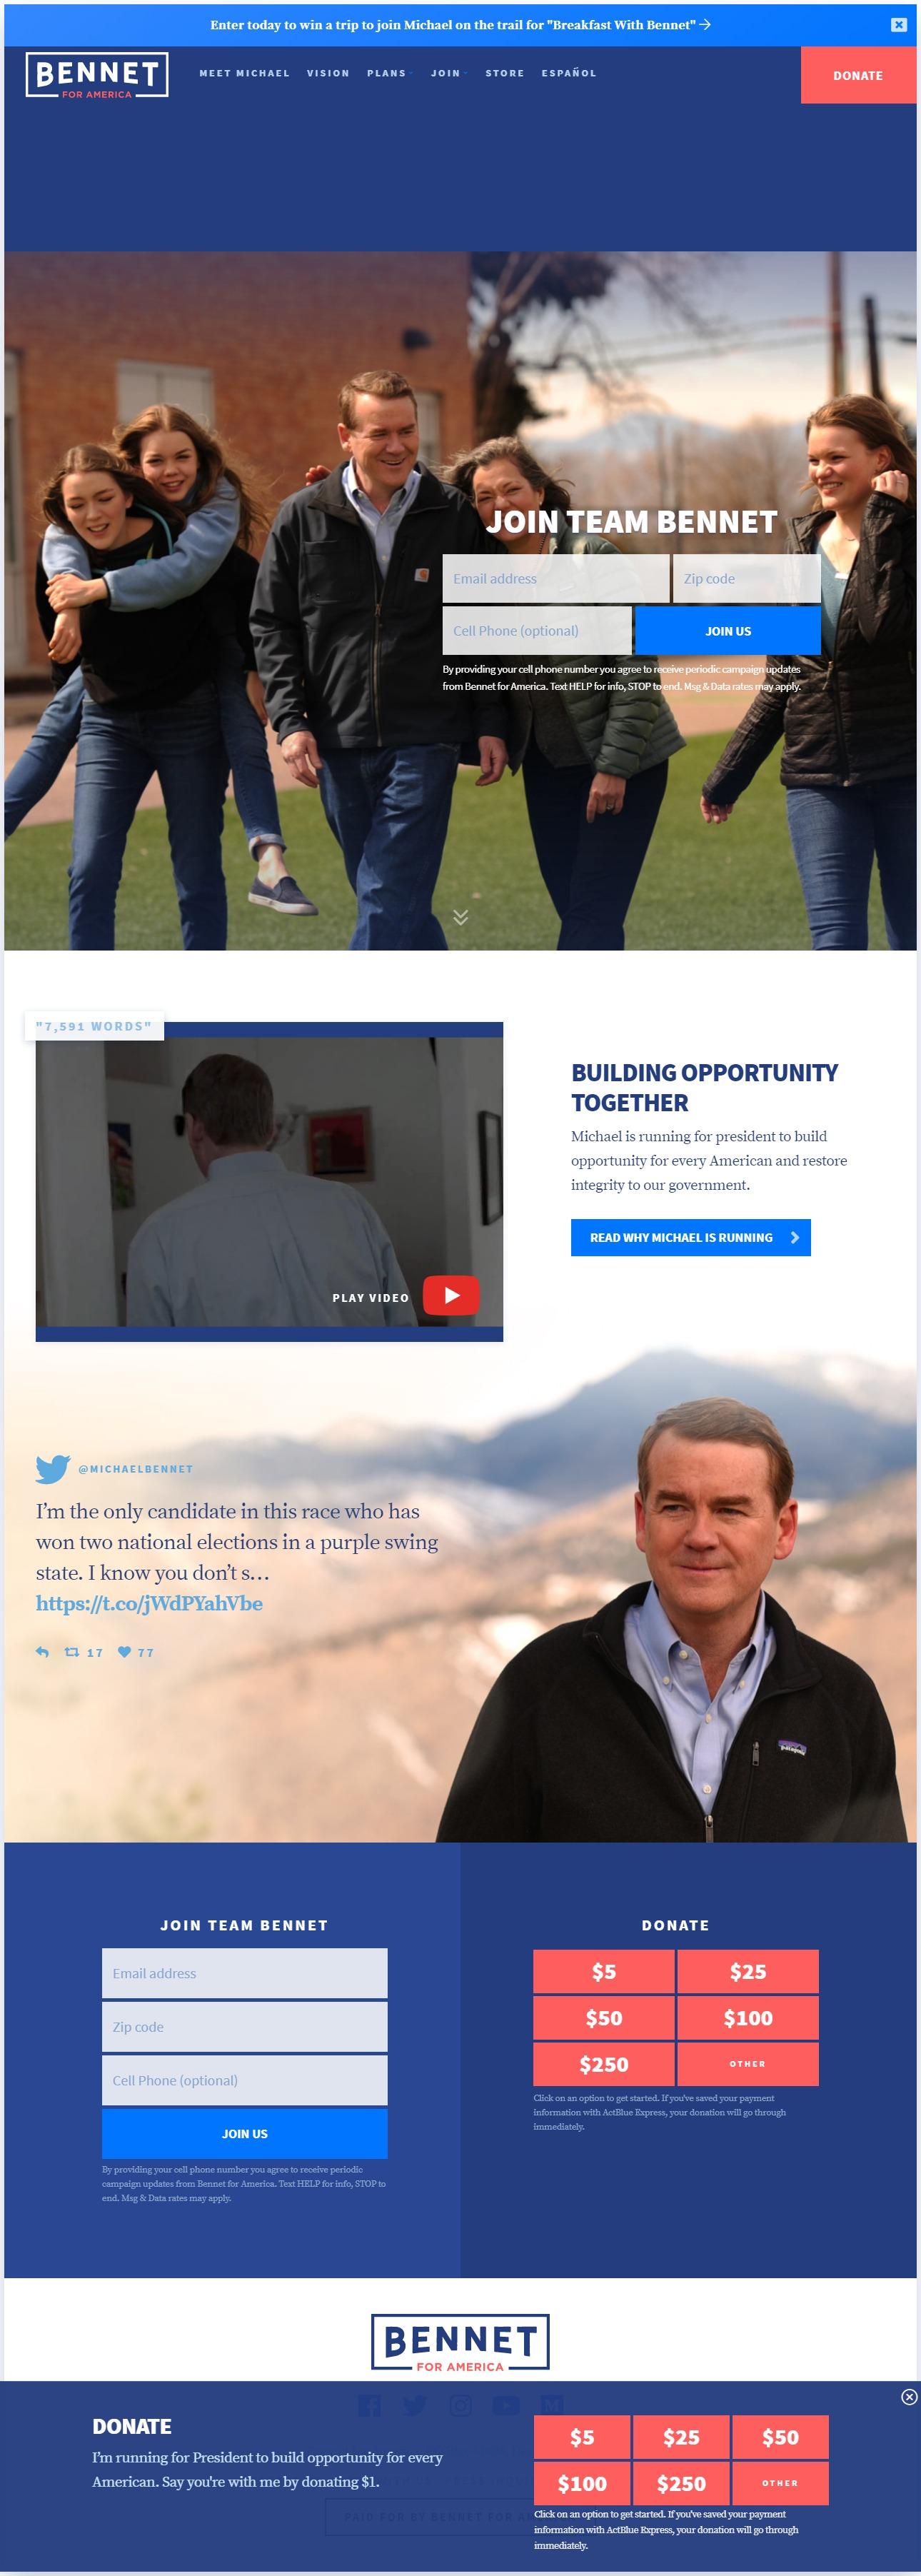 Homepage Snapshot for December 1, 2019: Senator Michael Bennet